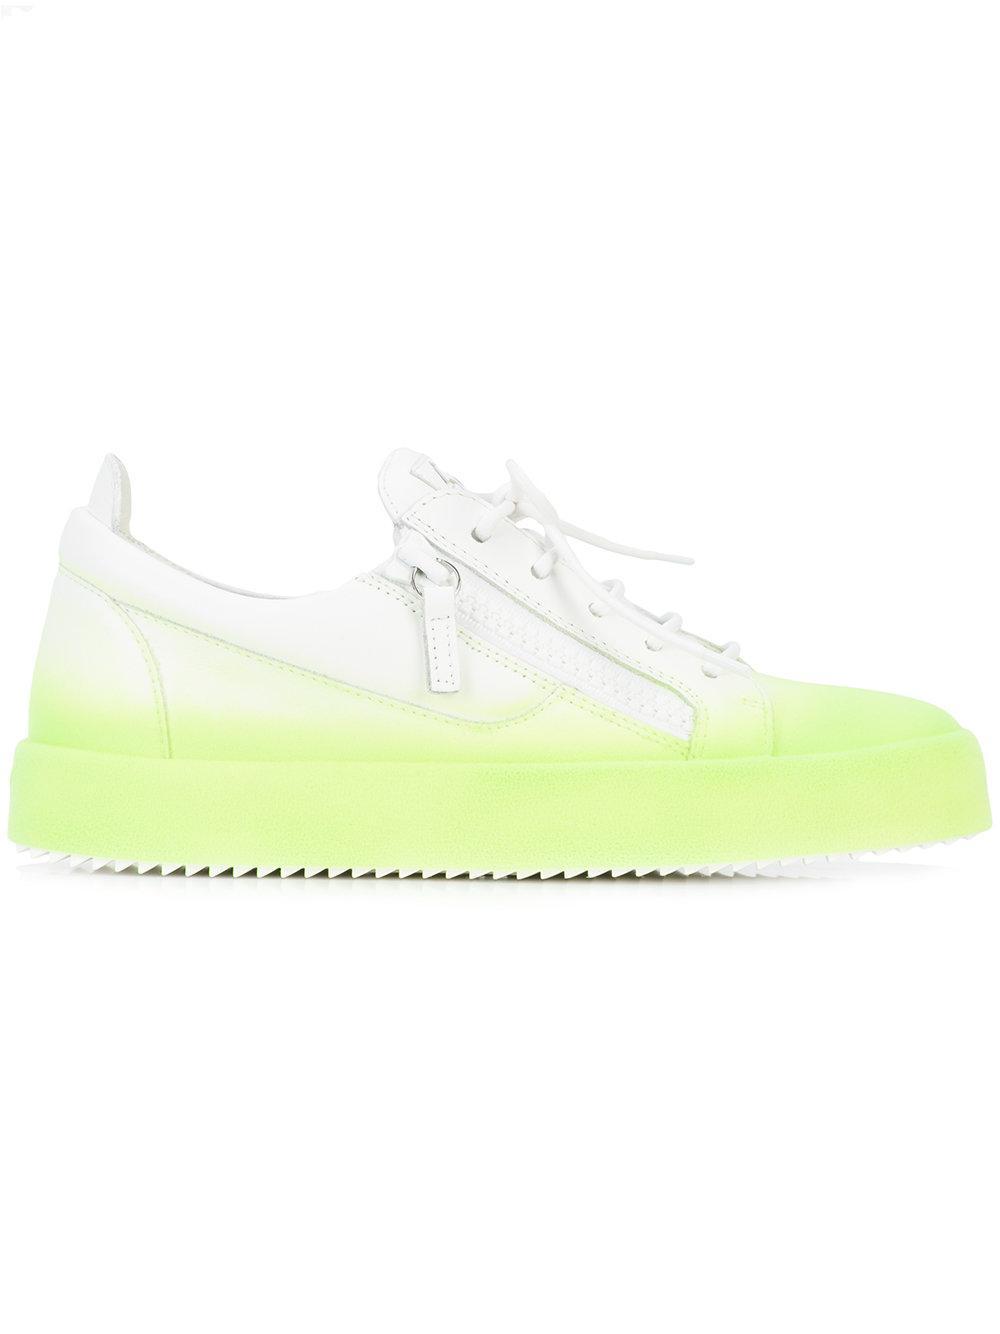 Giuseppe Zanotti New Unfinished Sneakers